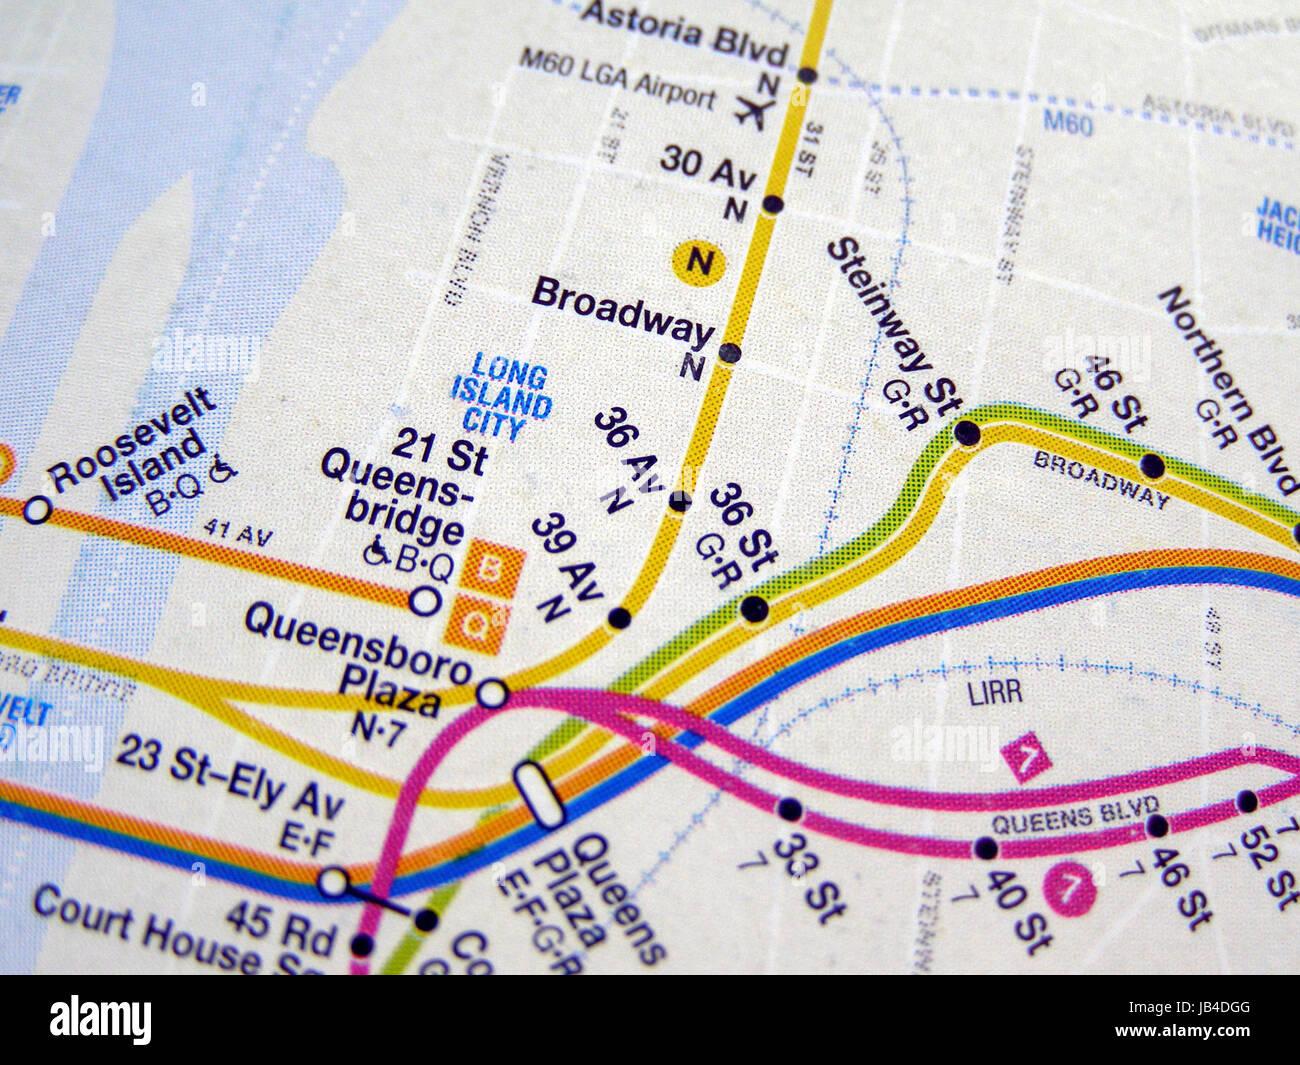 U Bahn Karte New York.New York Usa 25 Juni 2008 U Bahn Karte Von Der New Yorker U